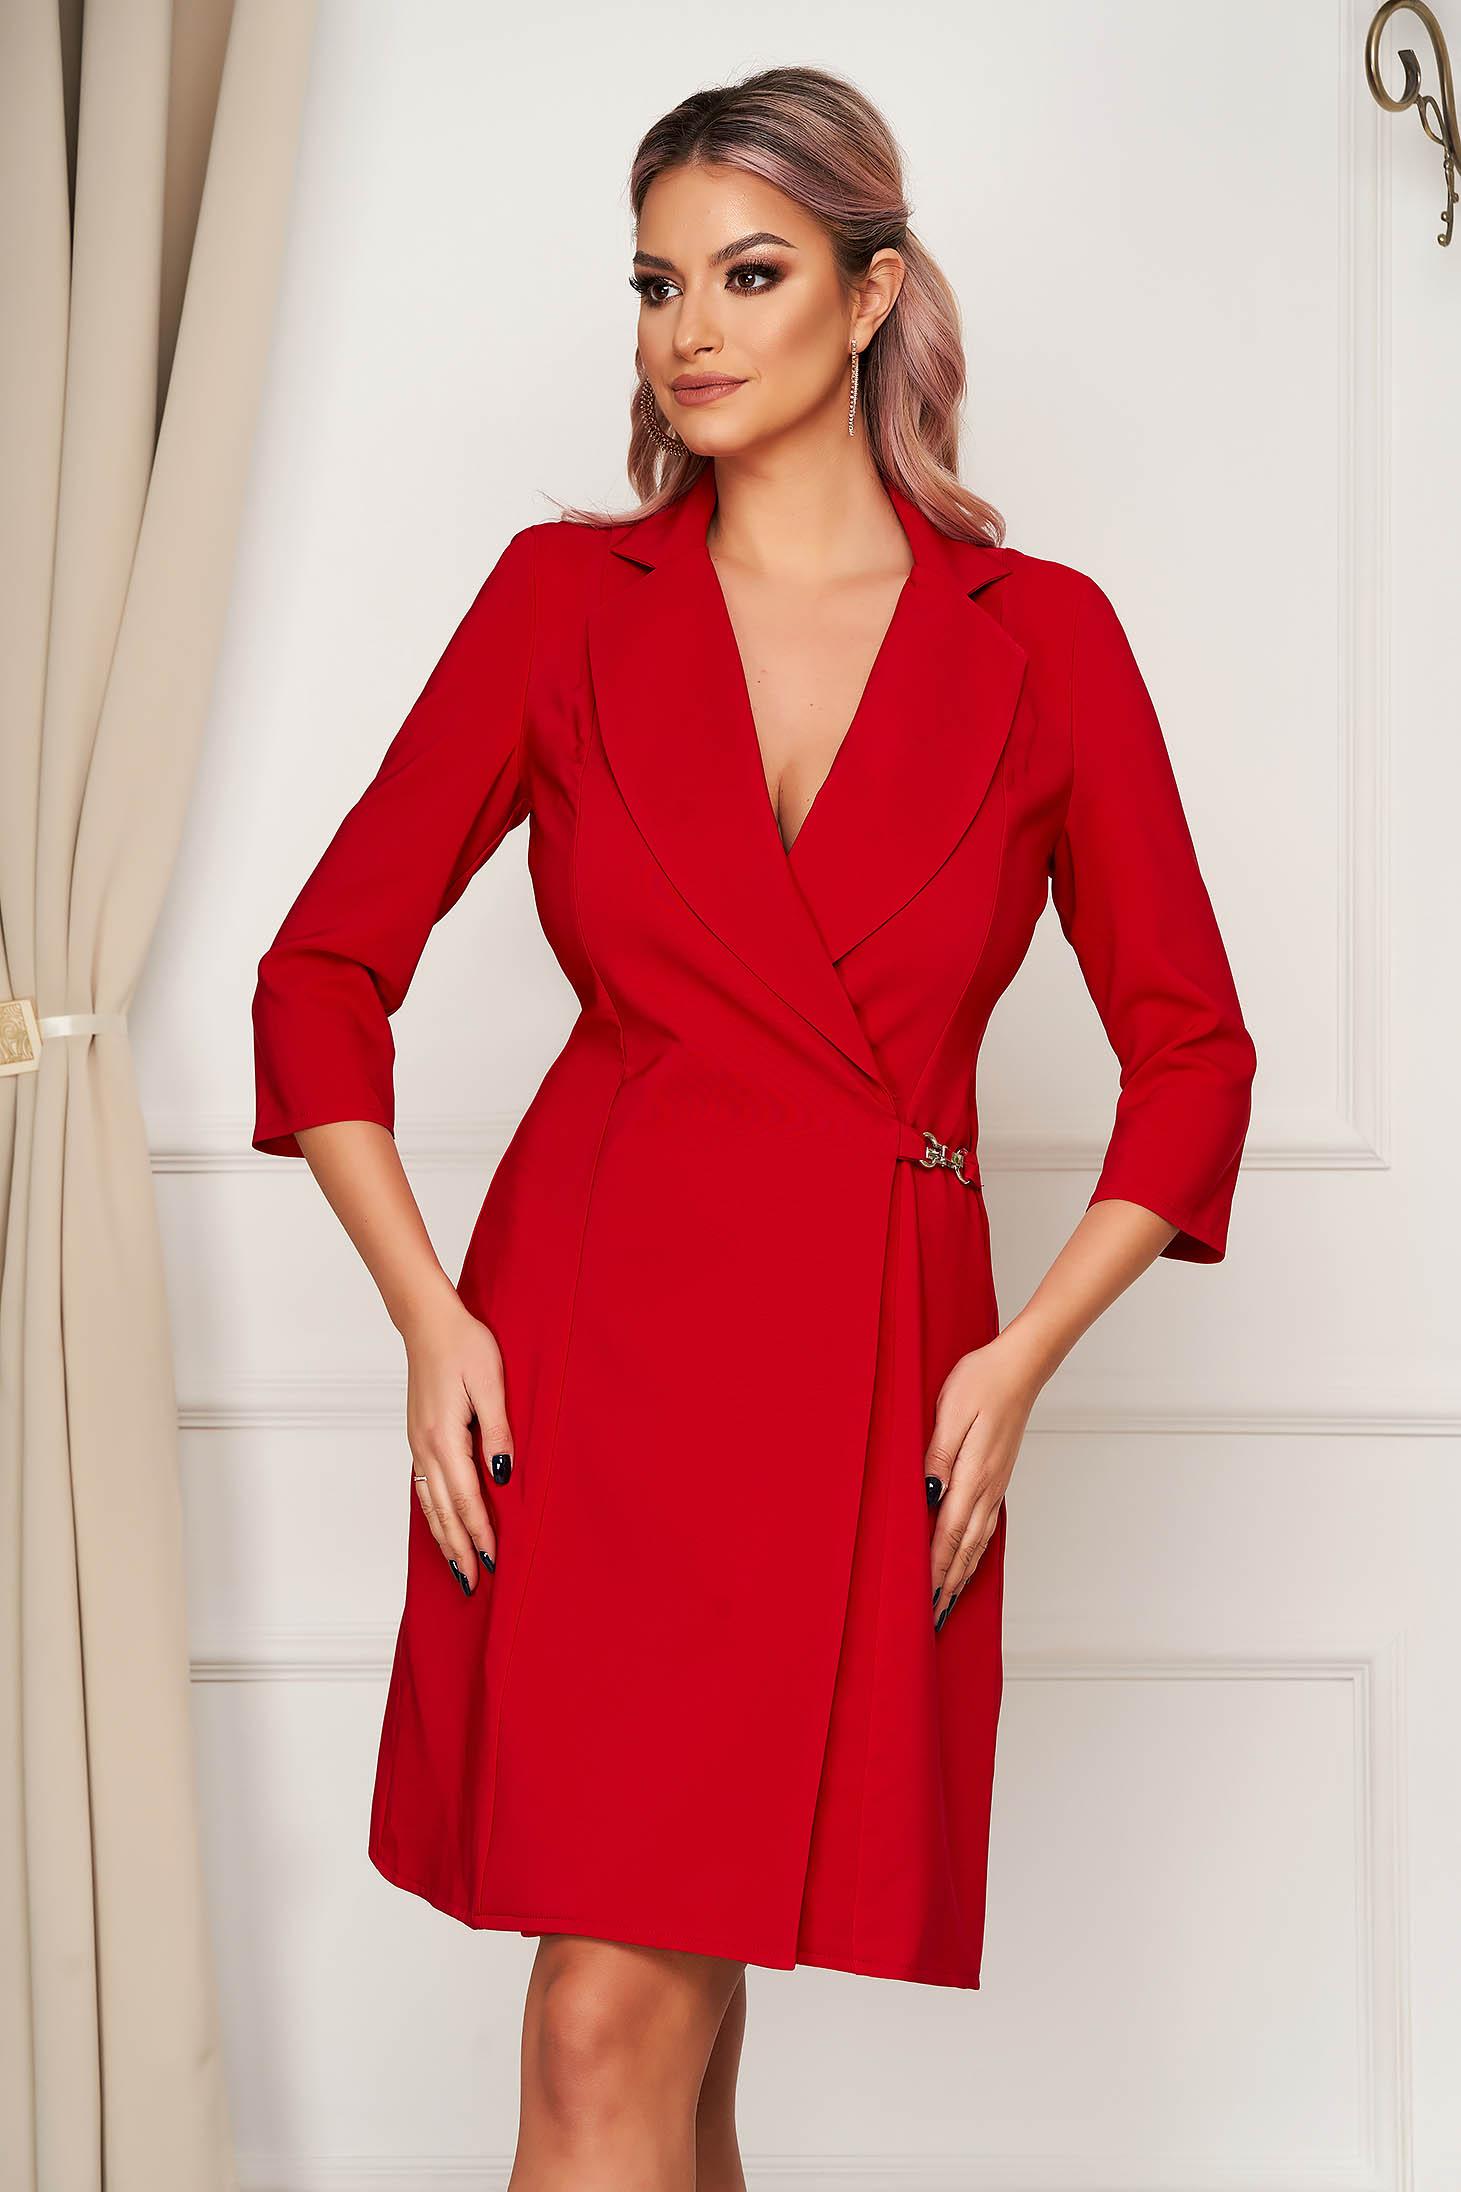 Elegant short cut pencil red dress wrap around cloth thin fabric